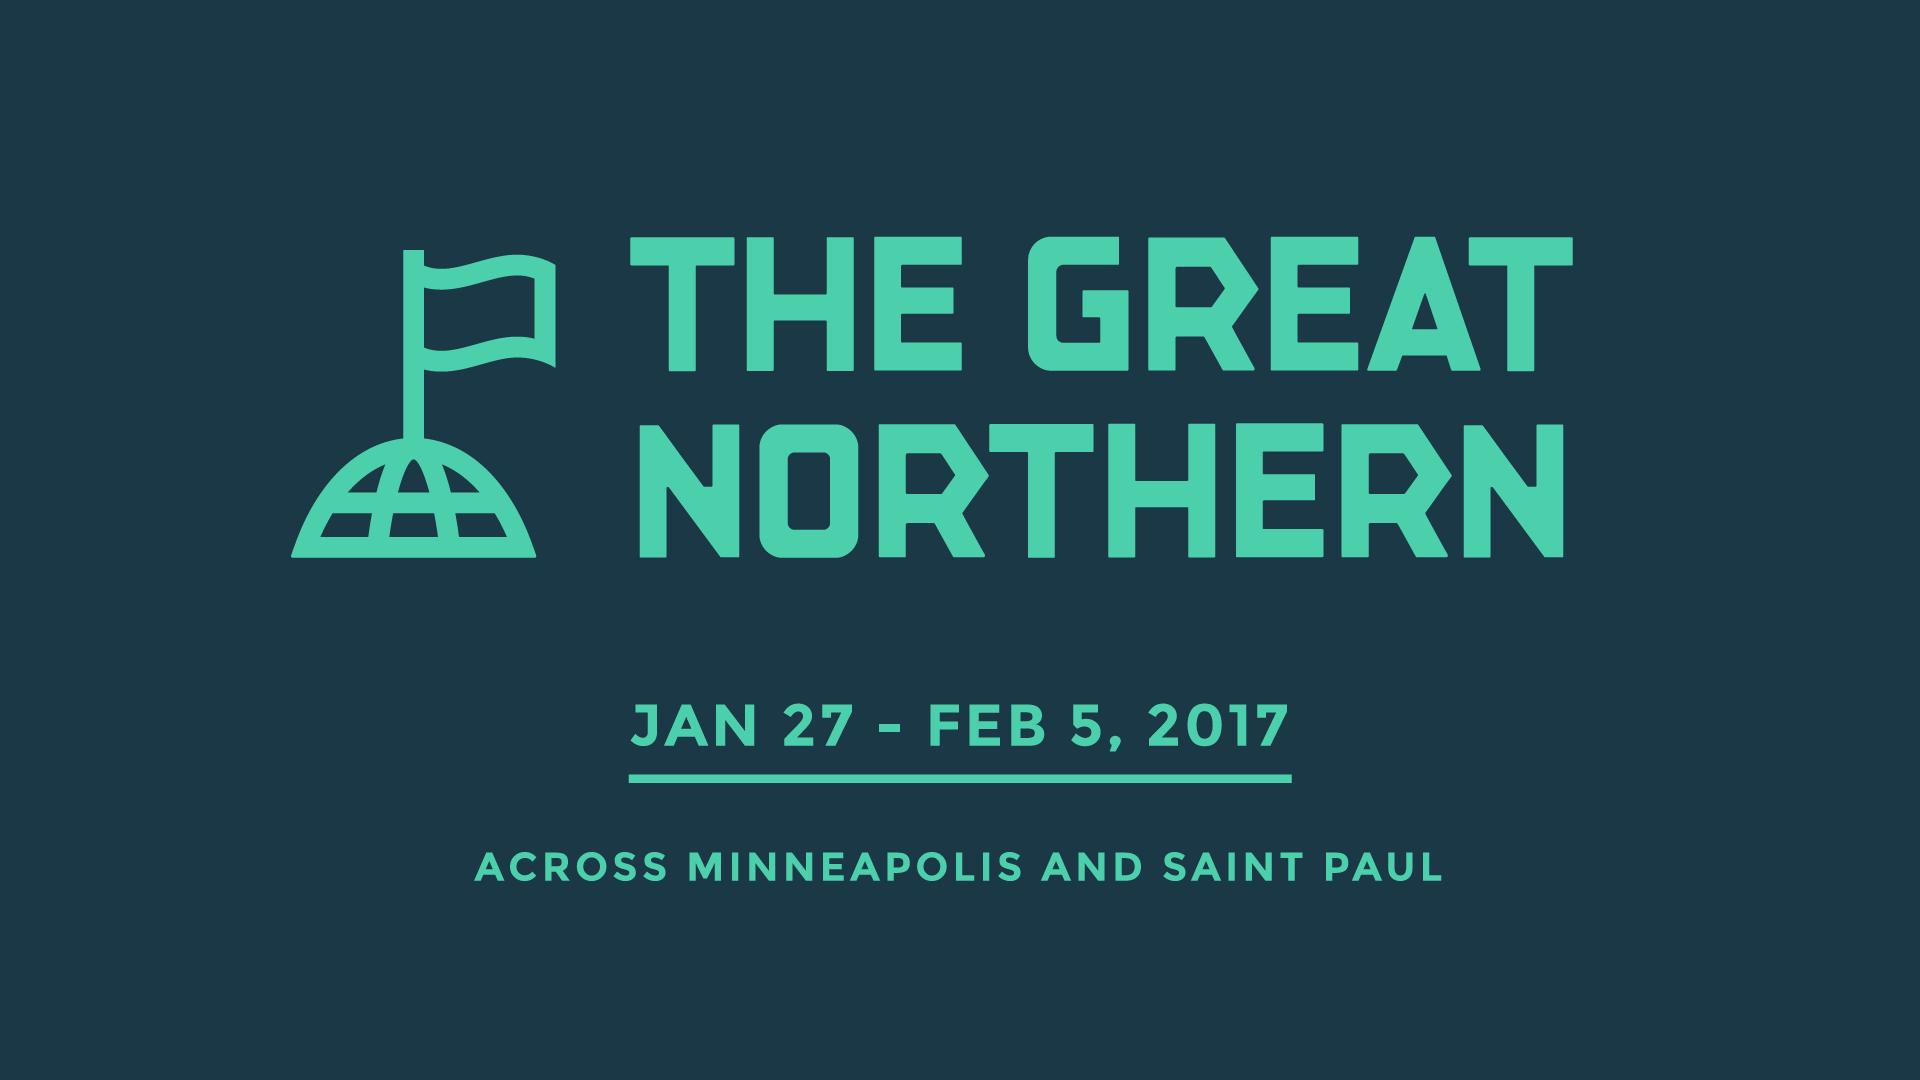 Gallery Of Home Improvement Design Expo Mpls Minneapolis Kitchen U Bathroom Remodeling Countertops Winter Events In Meet